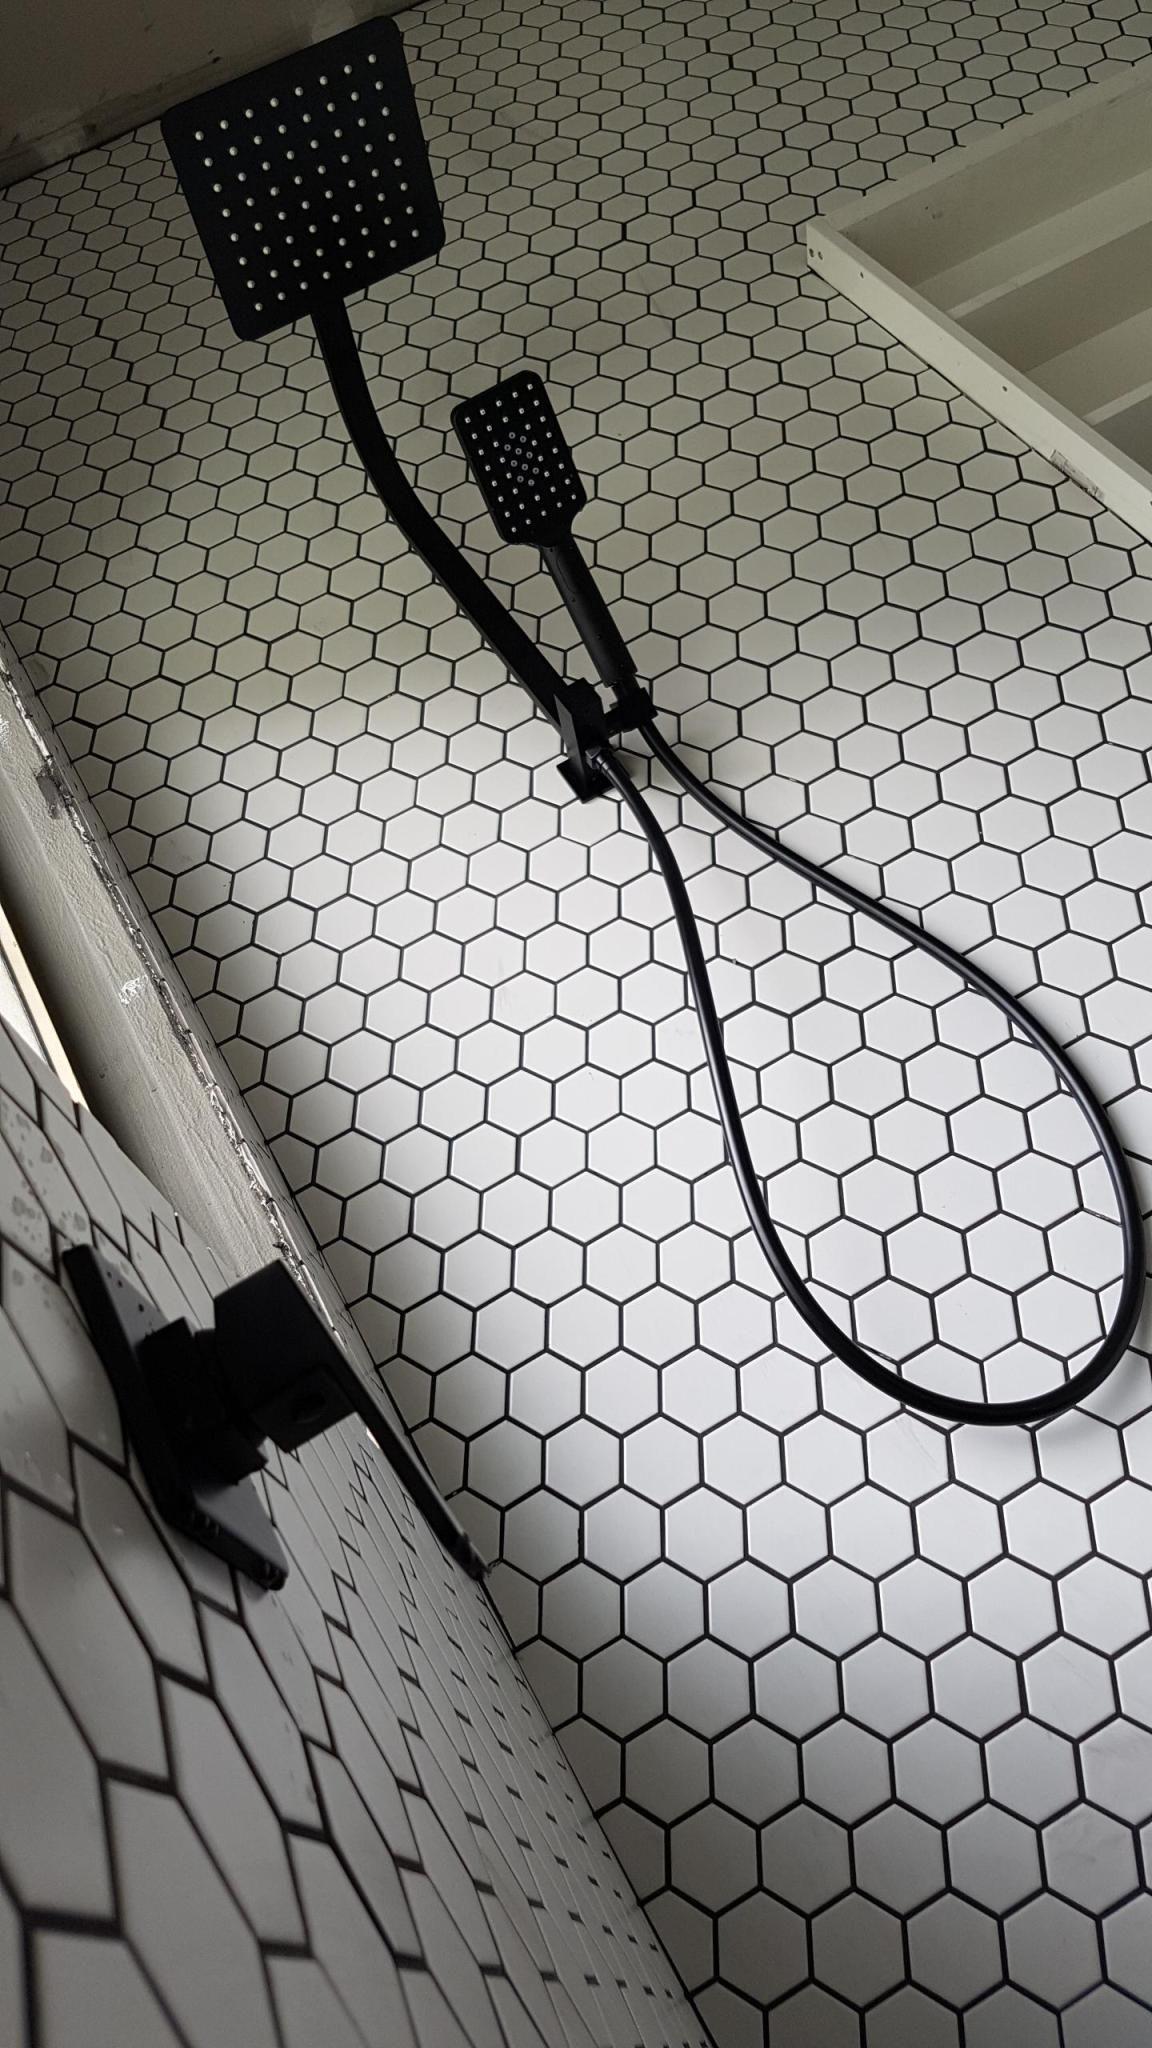 White Hexagonal Tile Black Grout Black White Bathroom Black Showers White Hexagon Tiles Black Bathroom Taps Black Grout